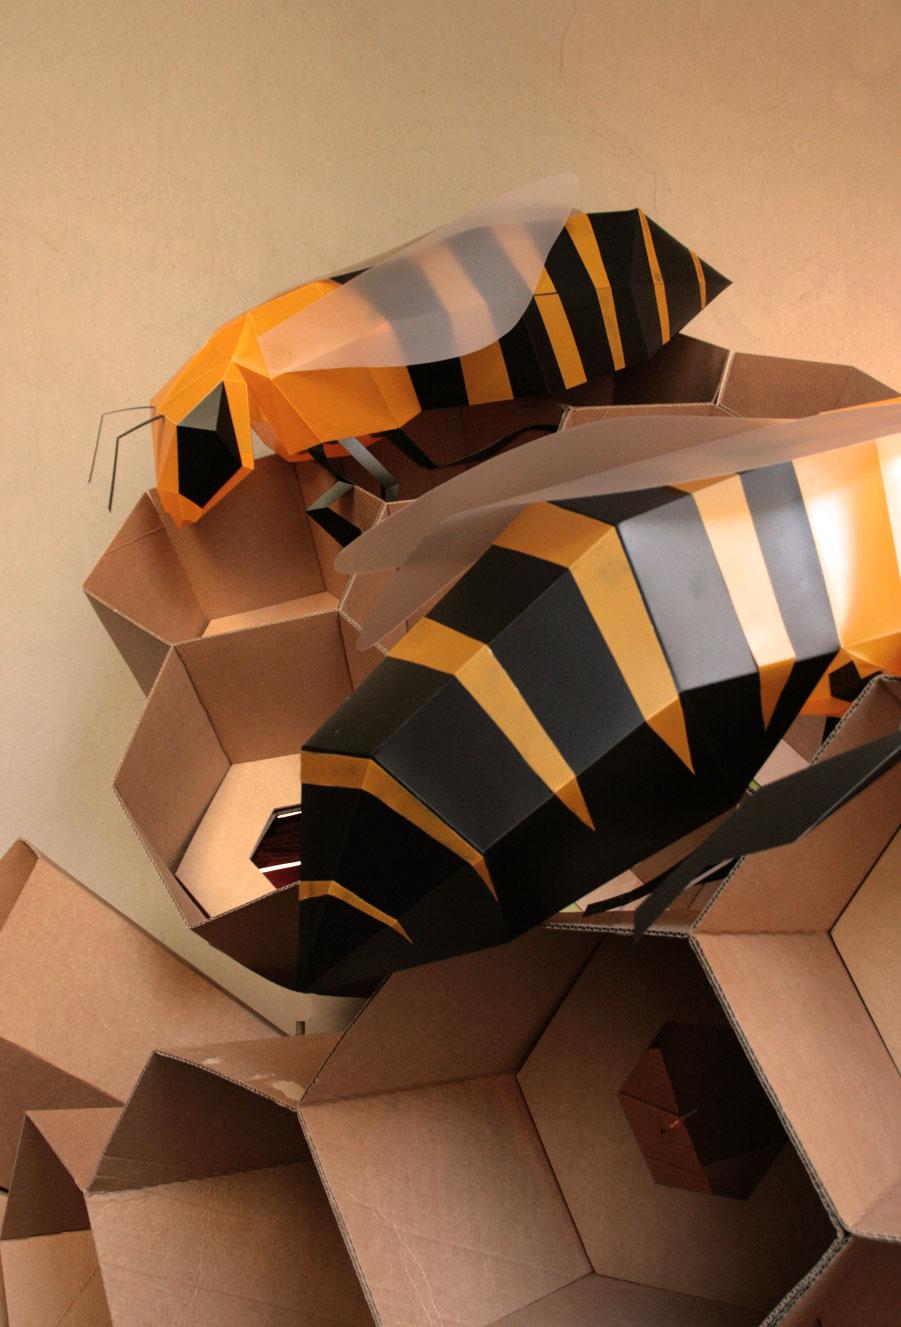 bee abelles abejas